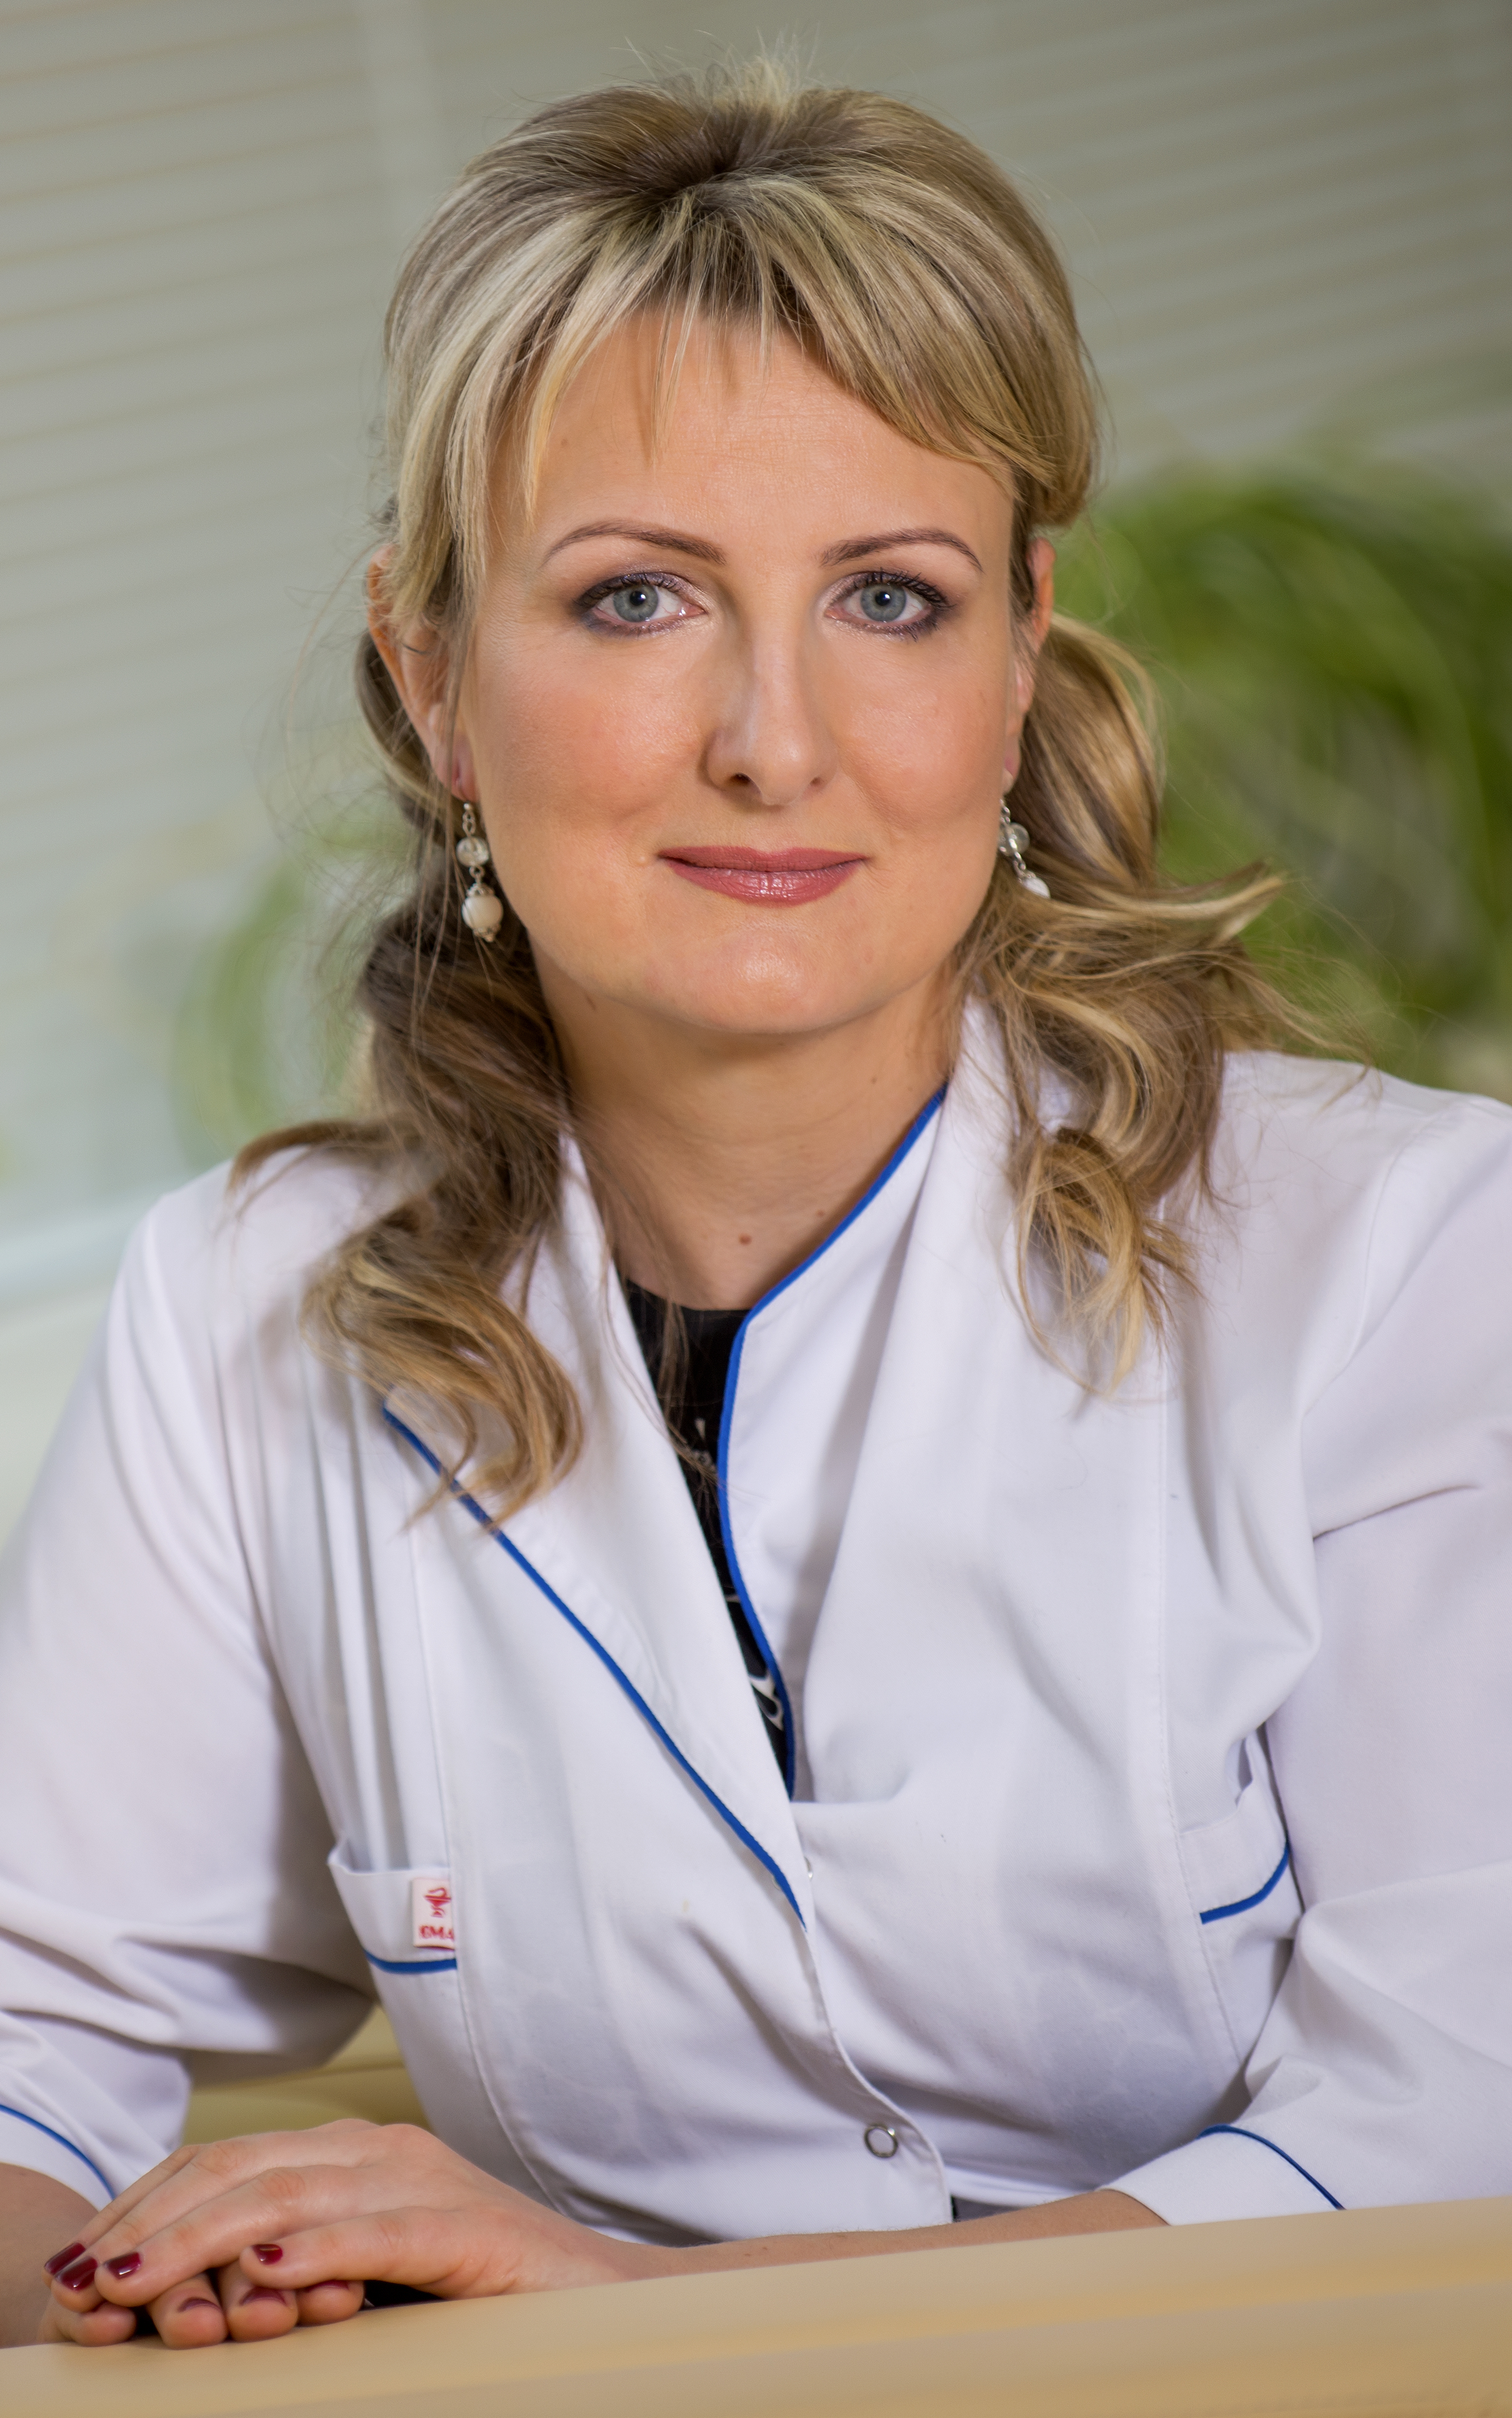 Леонова Ирина Александровна, кафедра детских болезней